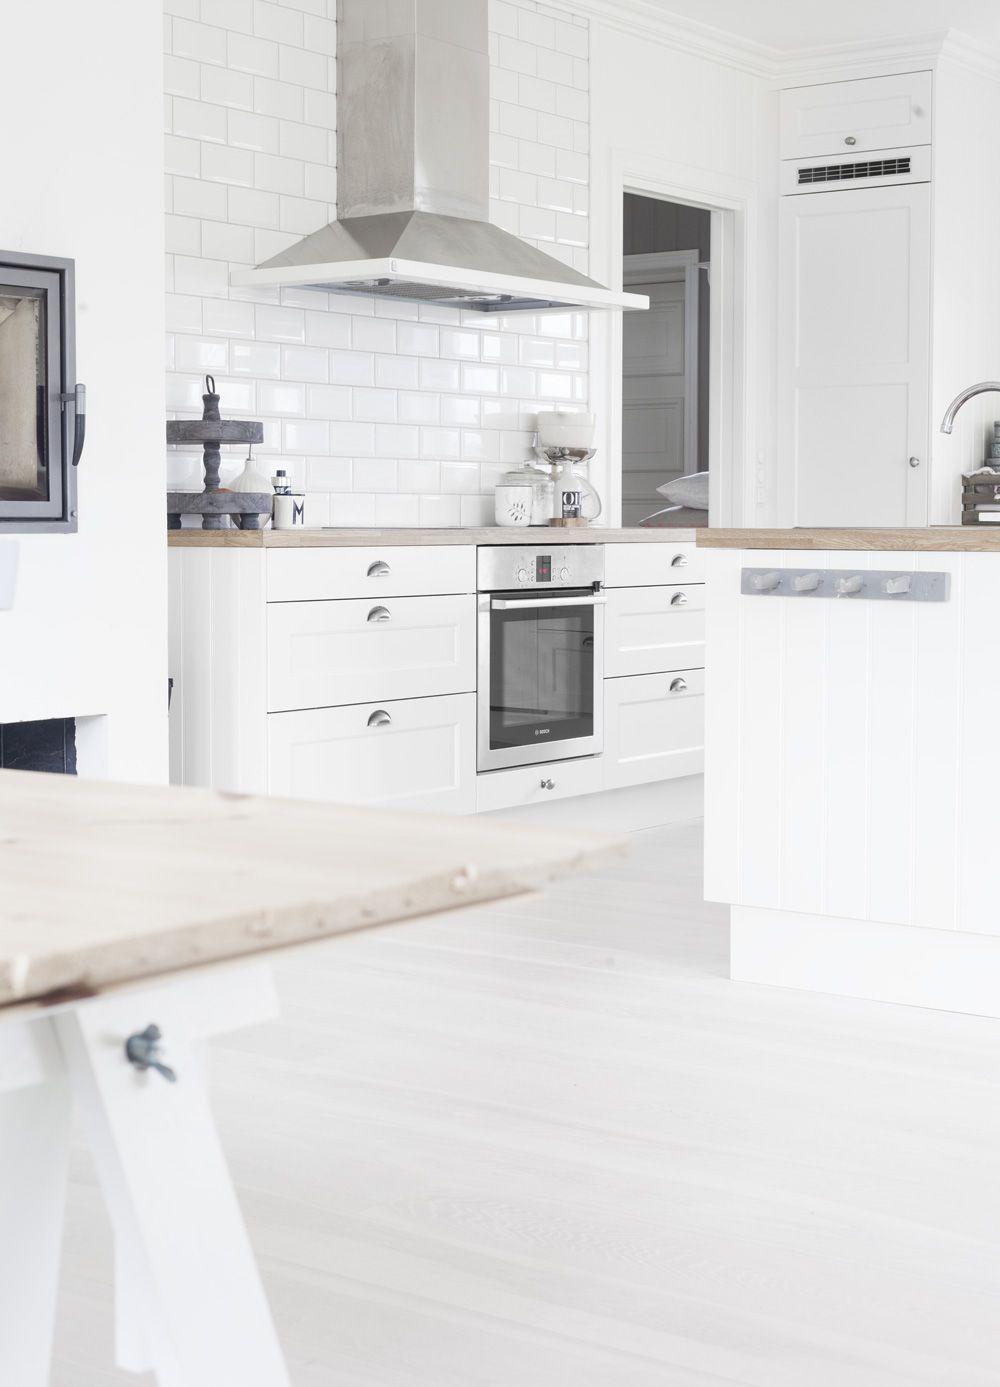 anetteshus kitchen9 home pinterest k che k che esszimmer und arbeitsplatte. Black Bedroom Furniture Sets. Home Design Ideas